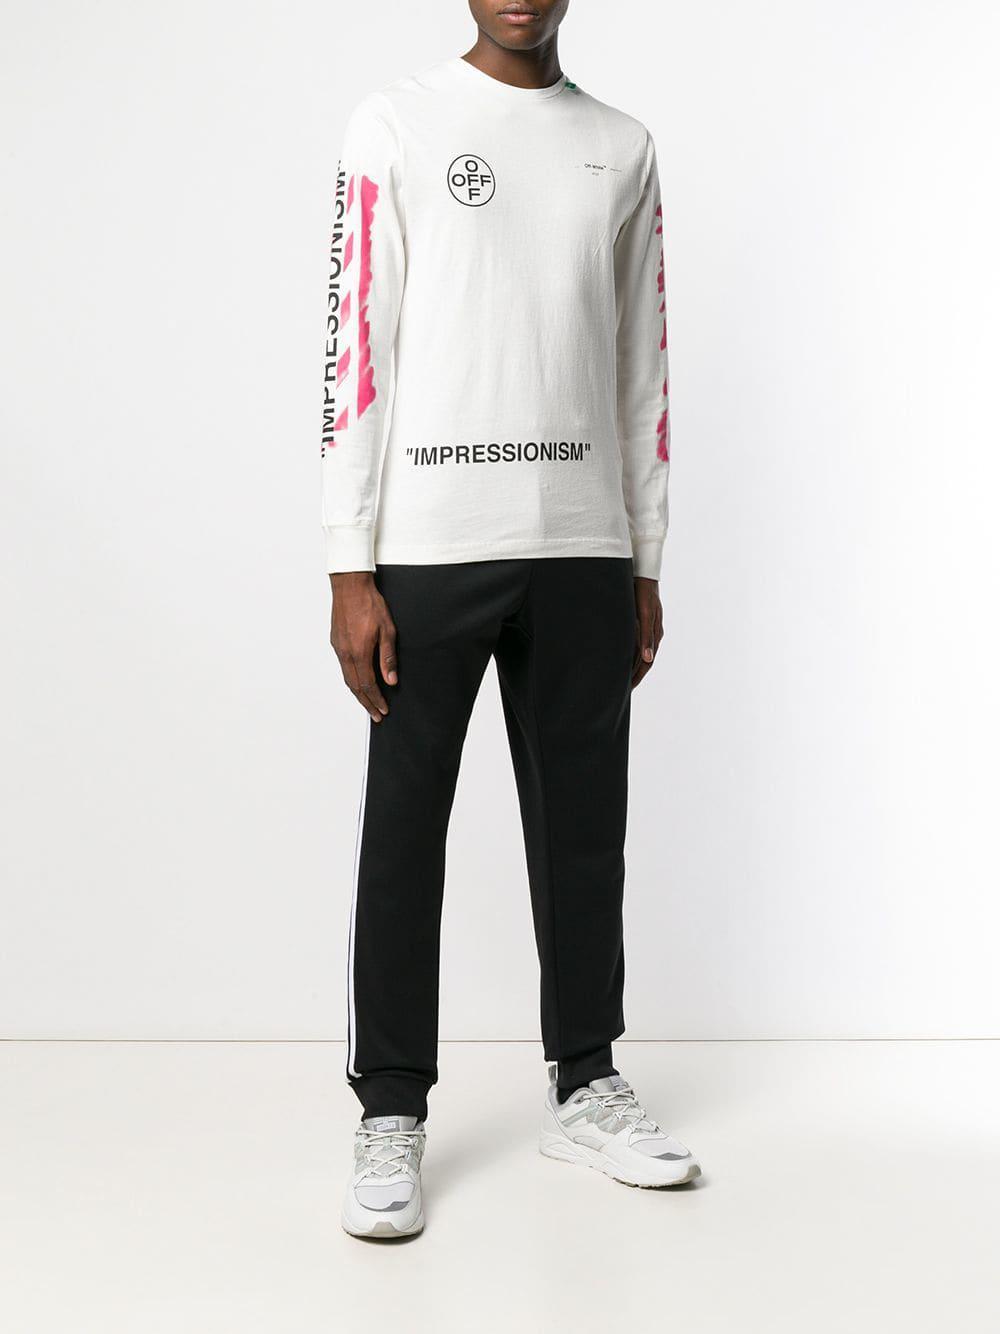 2499f963dfb1 ... Virgil Abloh - White Impressionism Sweatshirt for Men - Lyst. View  fullscreen